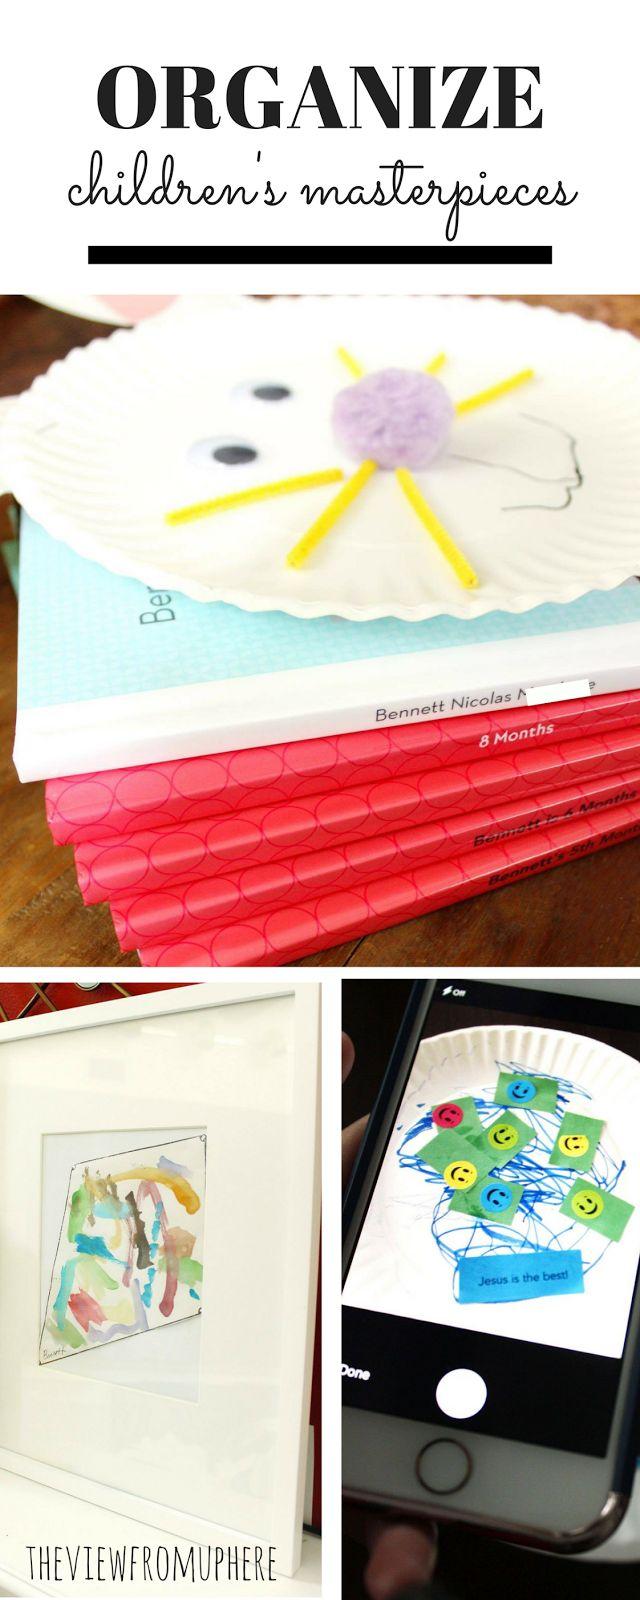 The View From Up Here: Organize Children's Masterpieces; organize artwork; organize child's work; organize; DIY organize; shutterfly book; artwork collage; frame artwork; artwork photobook